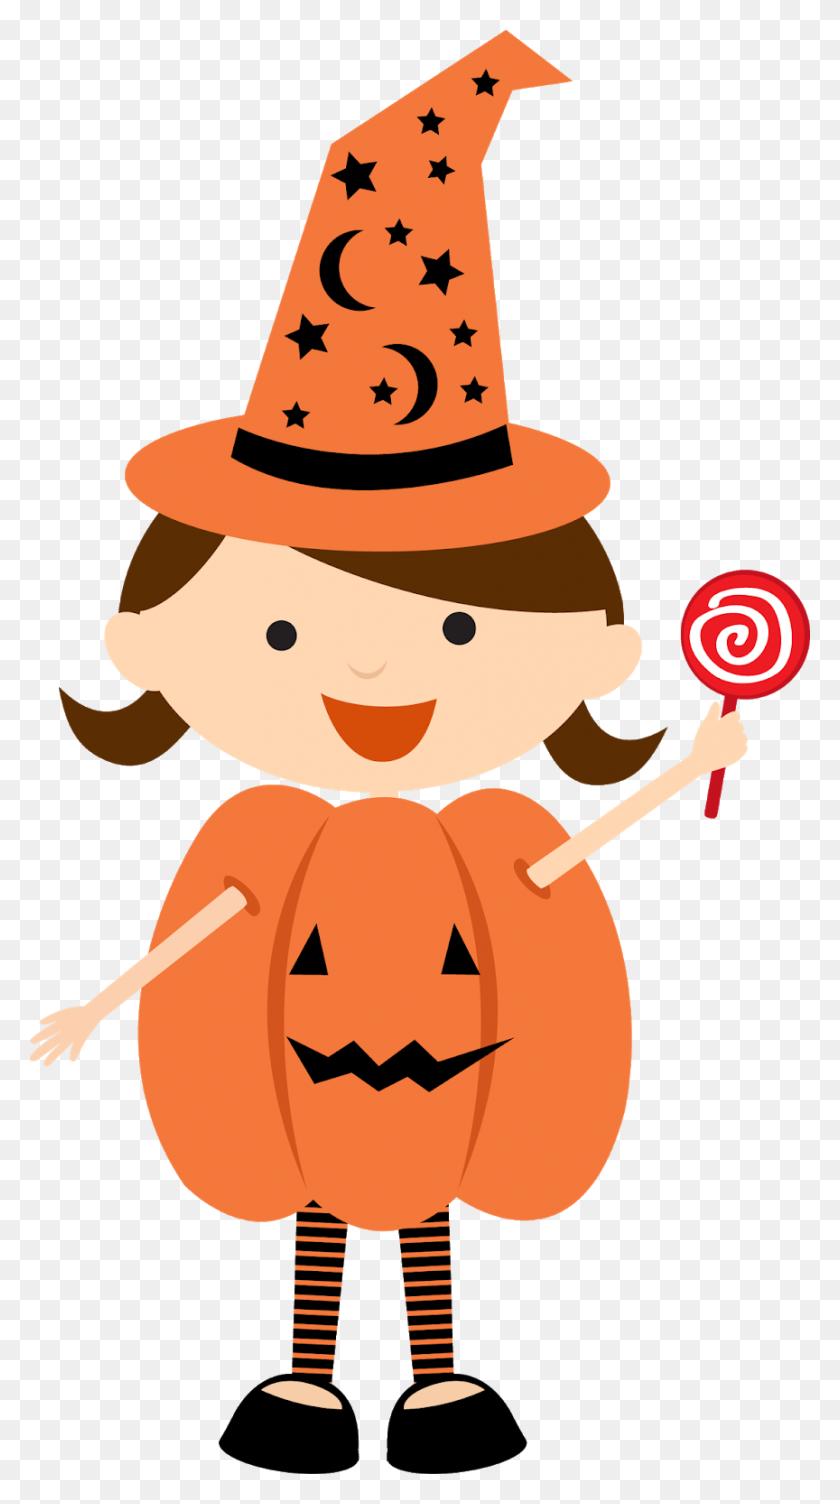 Trick or Treaters (Free Dearie Dolls Digi Stamps) - #dearie #dolls #stamps # treaters #trick - Trick or Treate… in 2020 | Digi stamps, Halloween  graphics, Halloween clipart